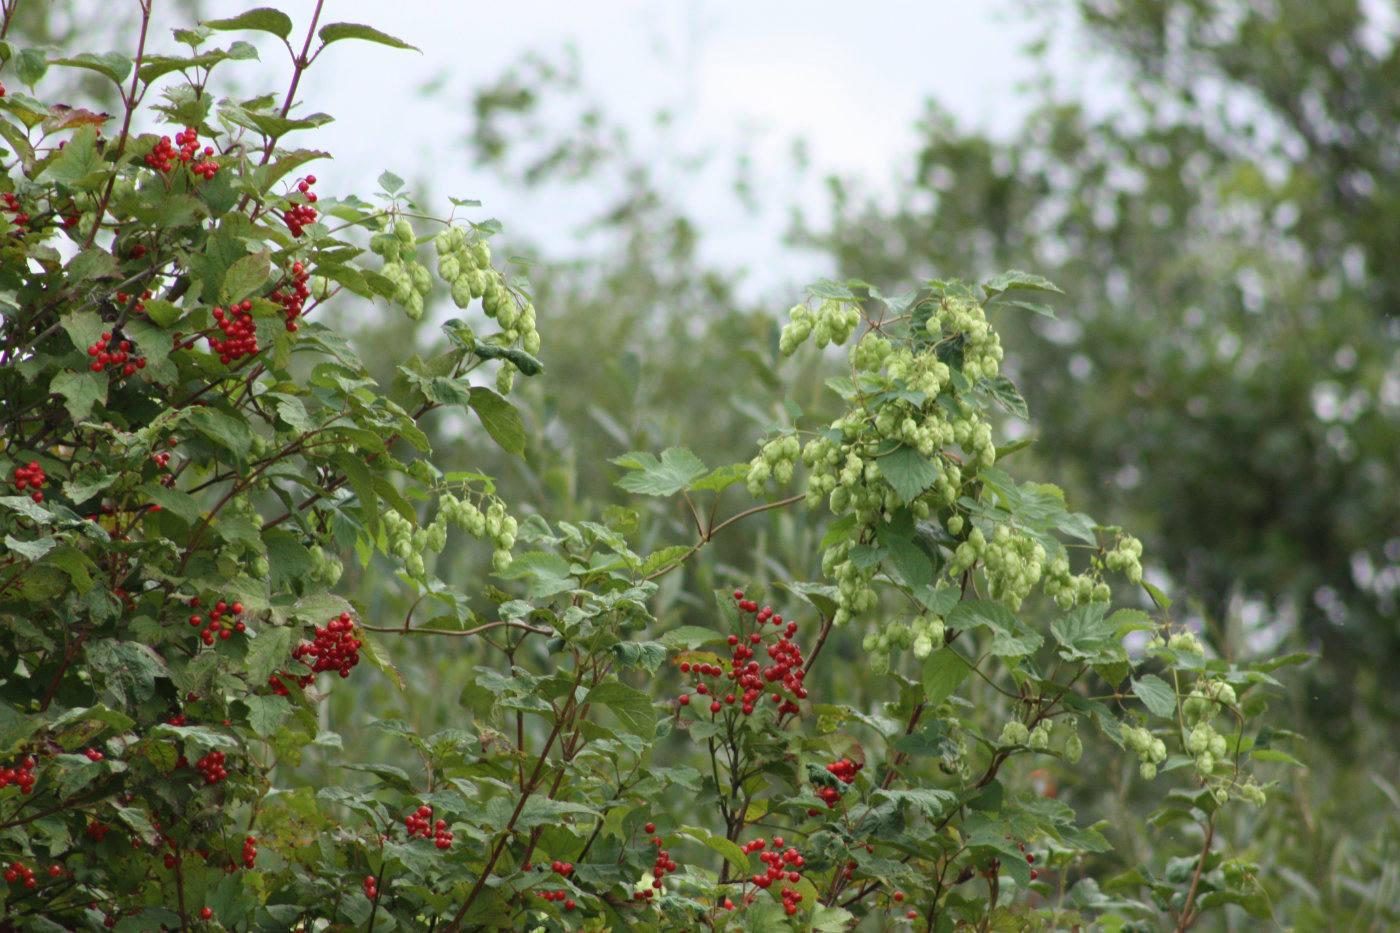 Guelder rose and Hops